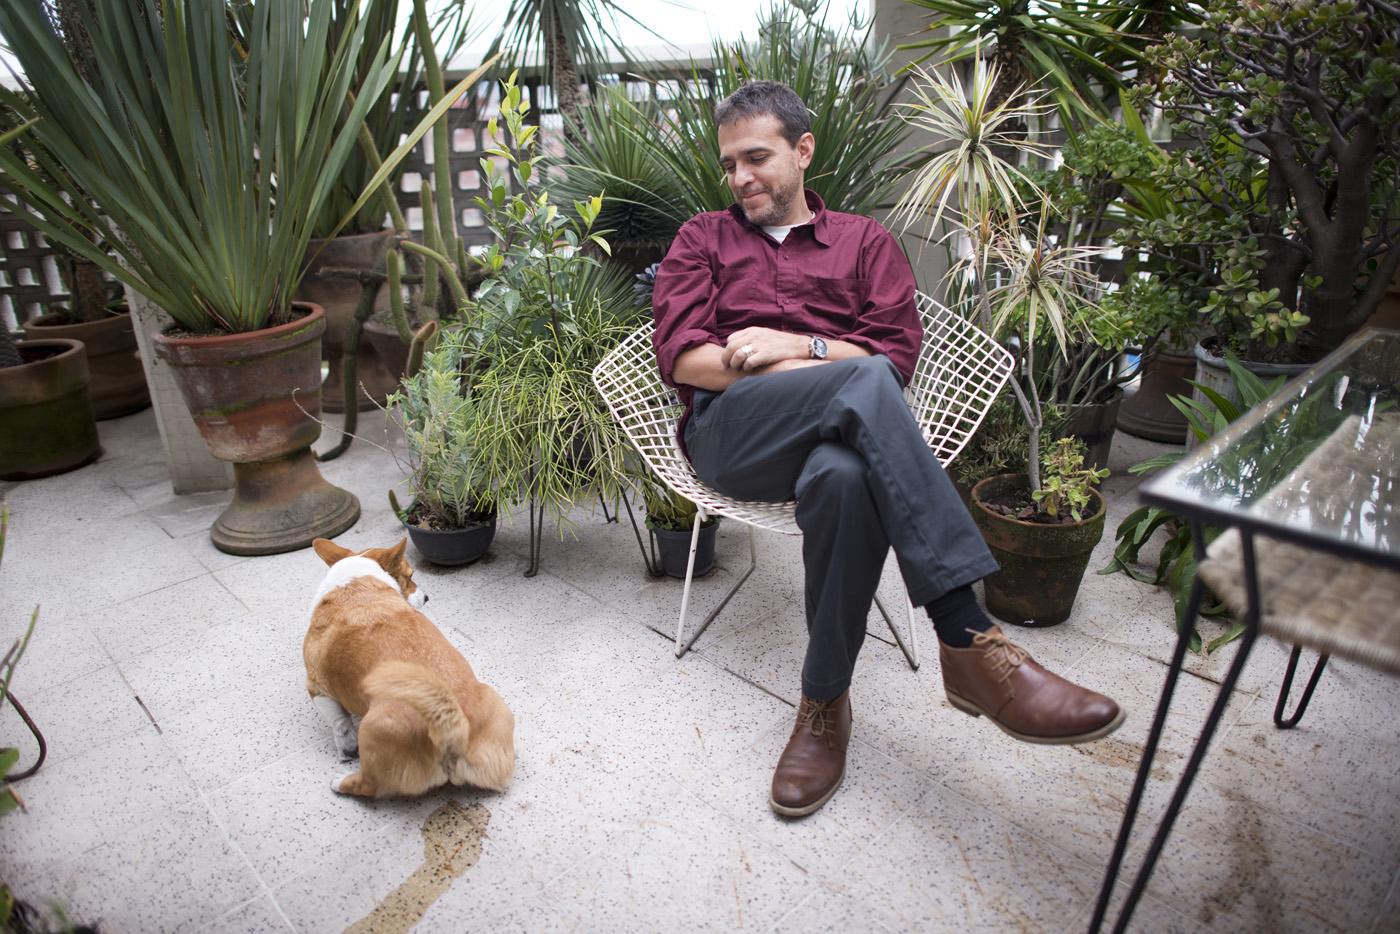 Artist and filmmaker Rafael Ortega, on his balcony in Progreso and Prosperidad, Escandon, Mexico City